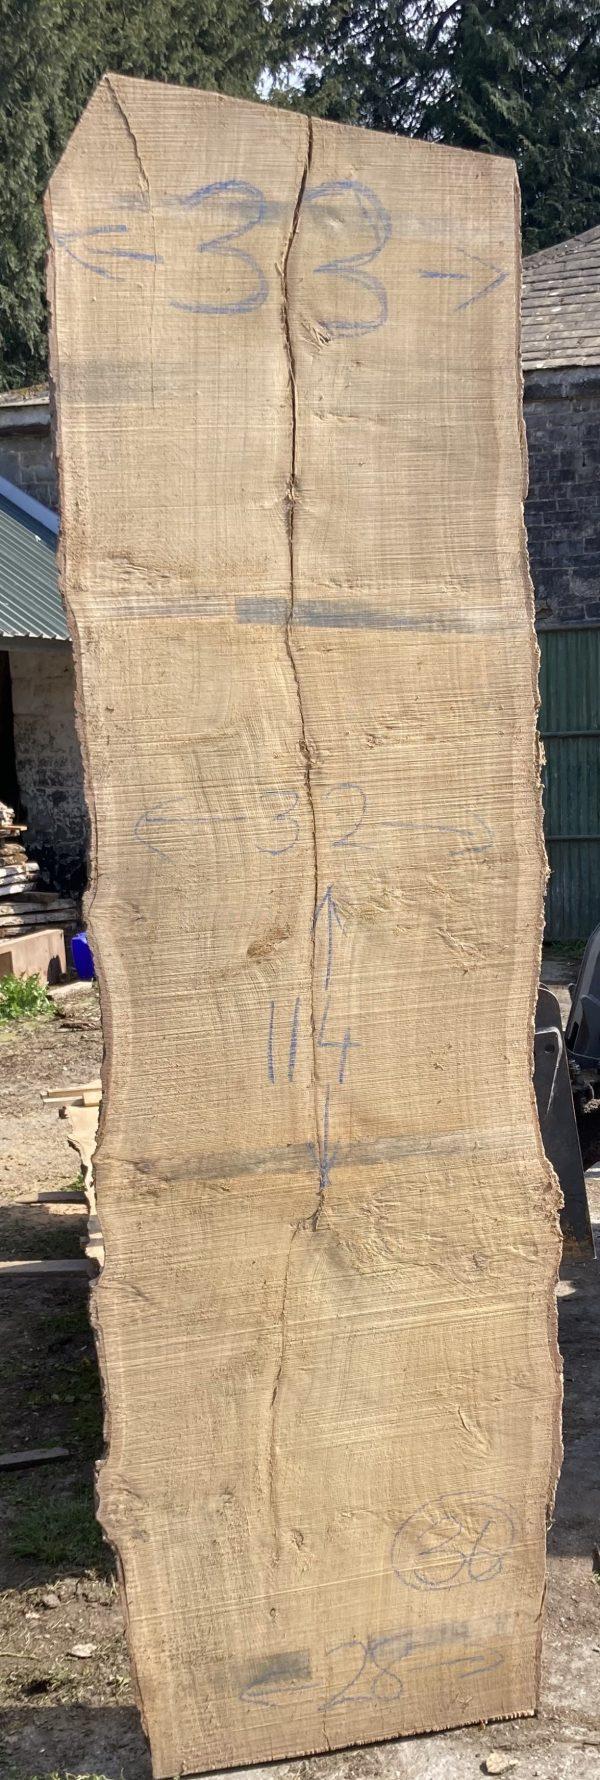 Oak - Raw live edge slab